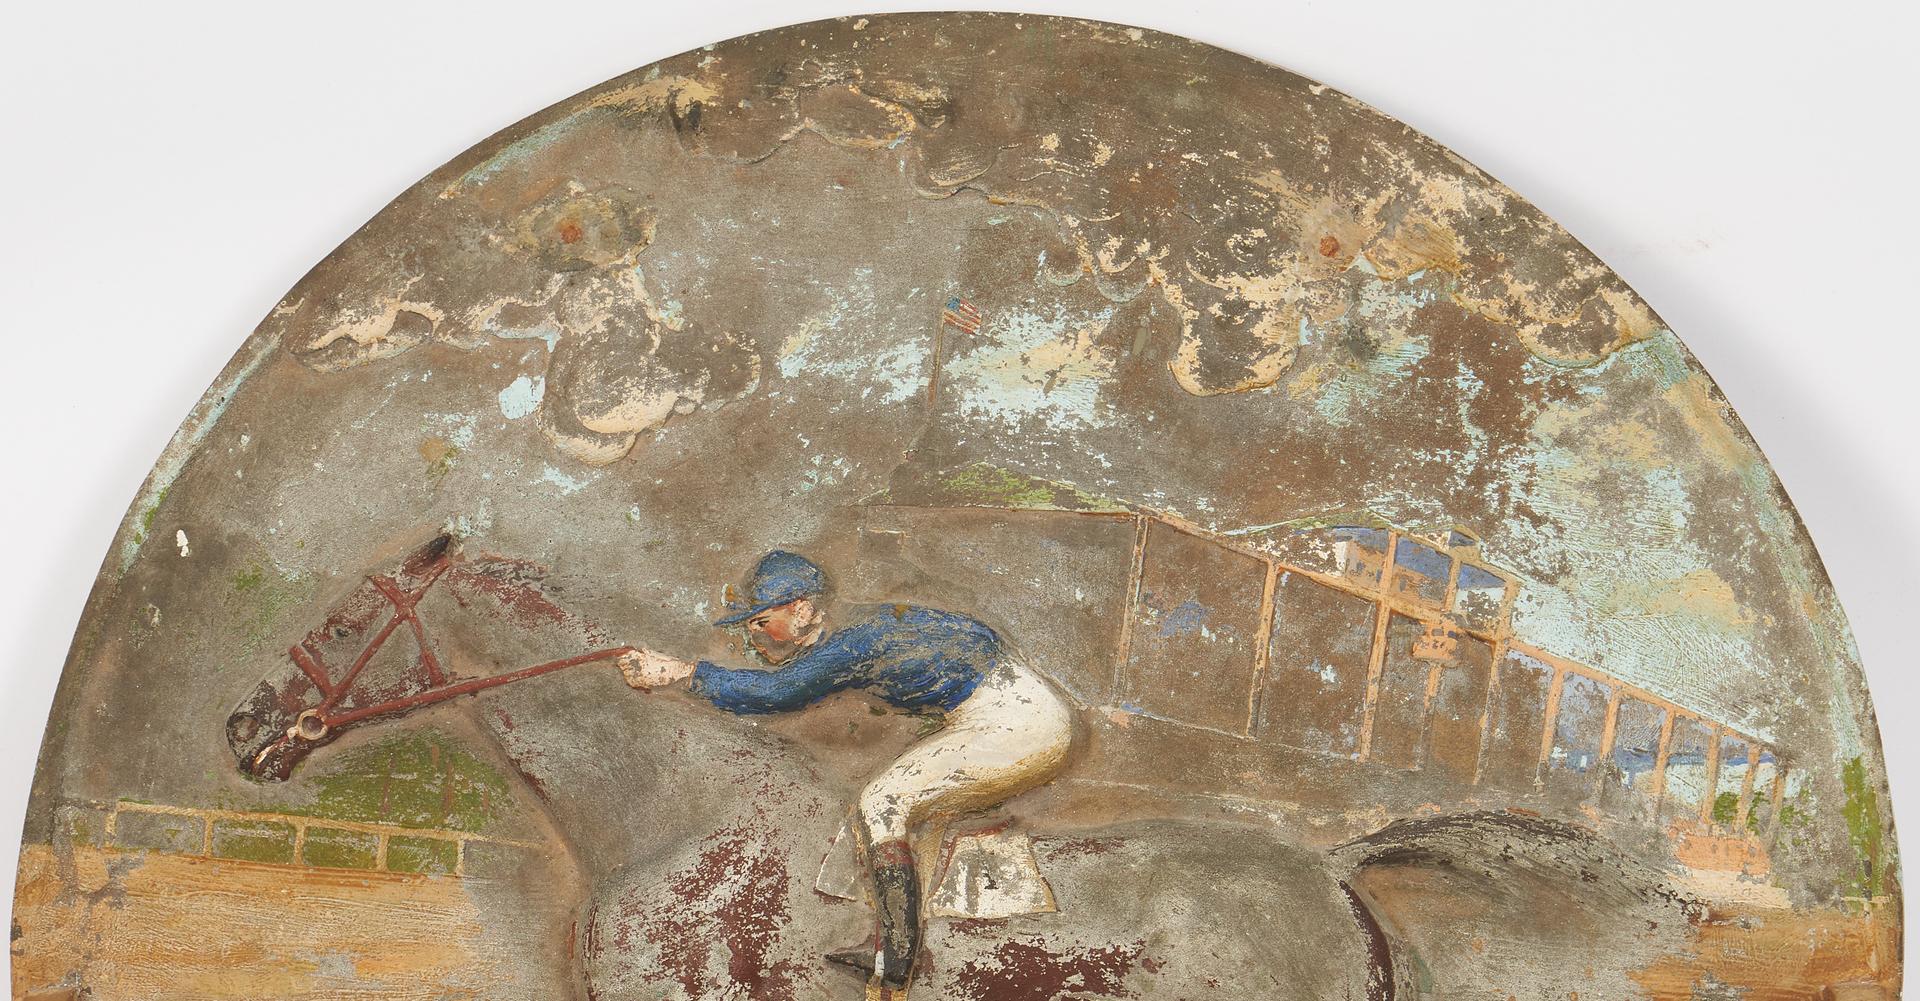 Lot 980: Pair of Antique Cast Iron Plaques, Jockeys w/ Racehorses